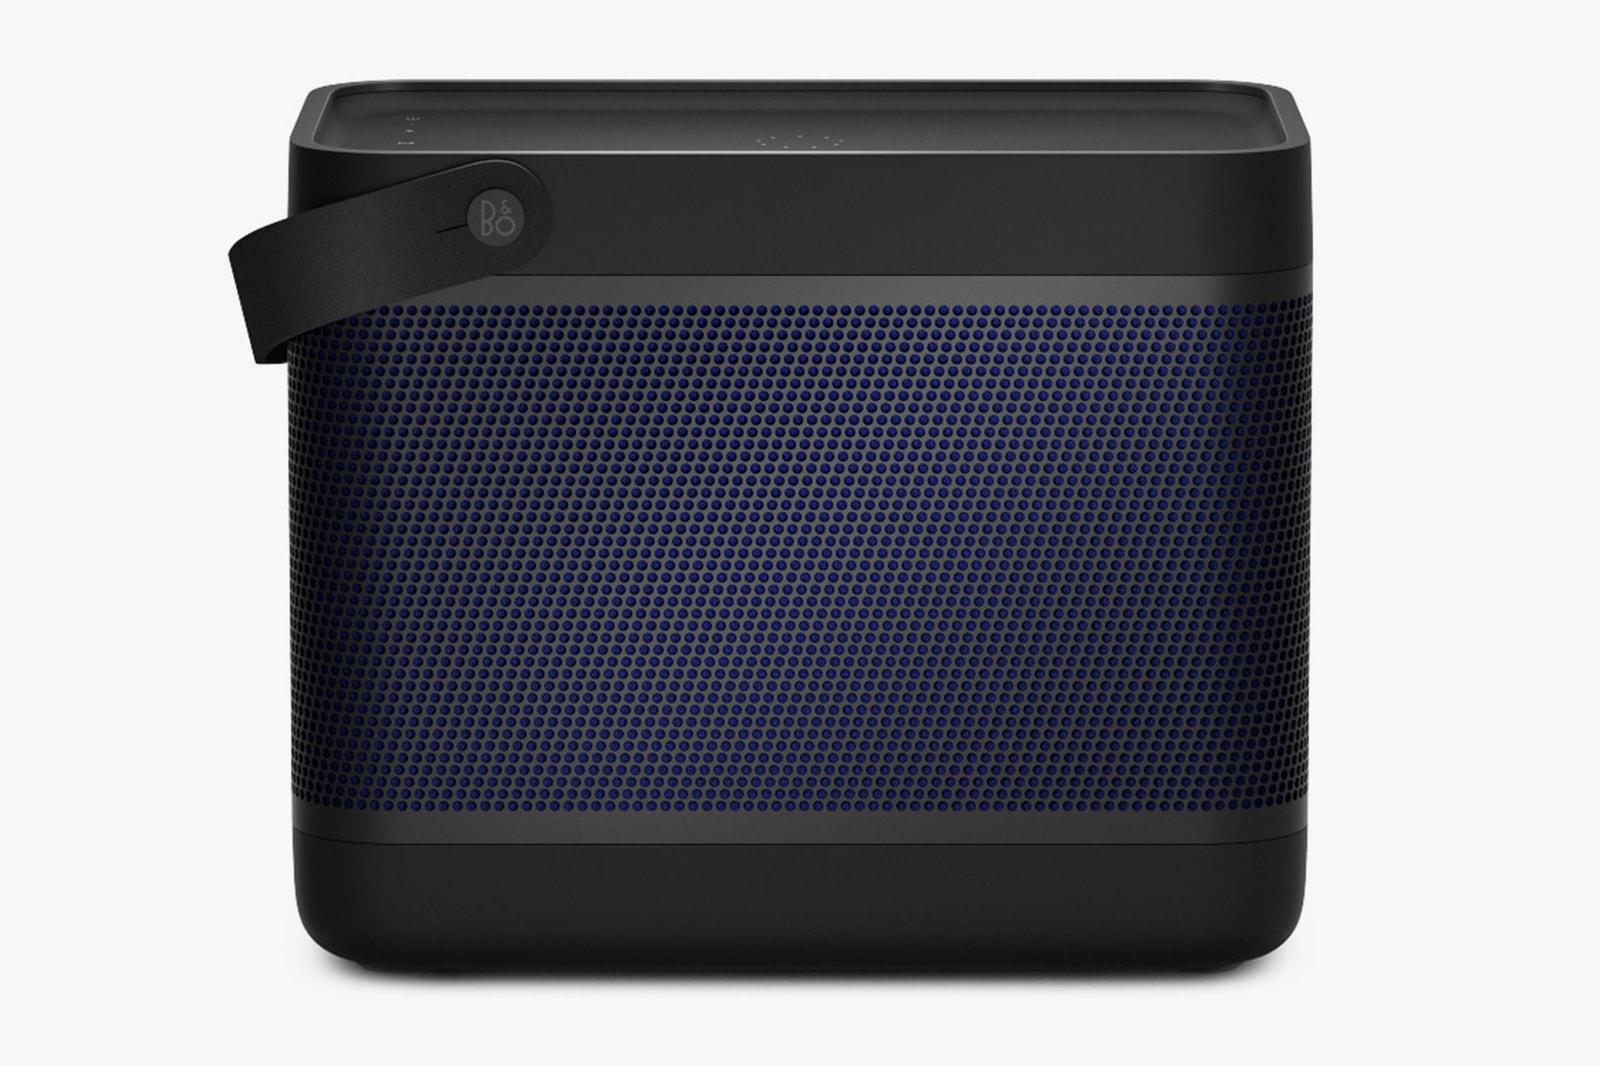 bang and olufsen beolit20 bluetooth speaker portable beige blue black anthracite grey mist price release